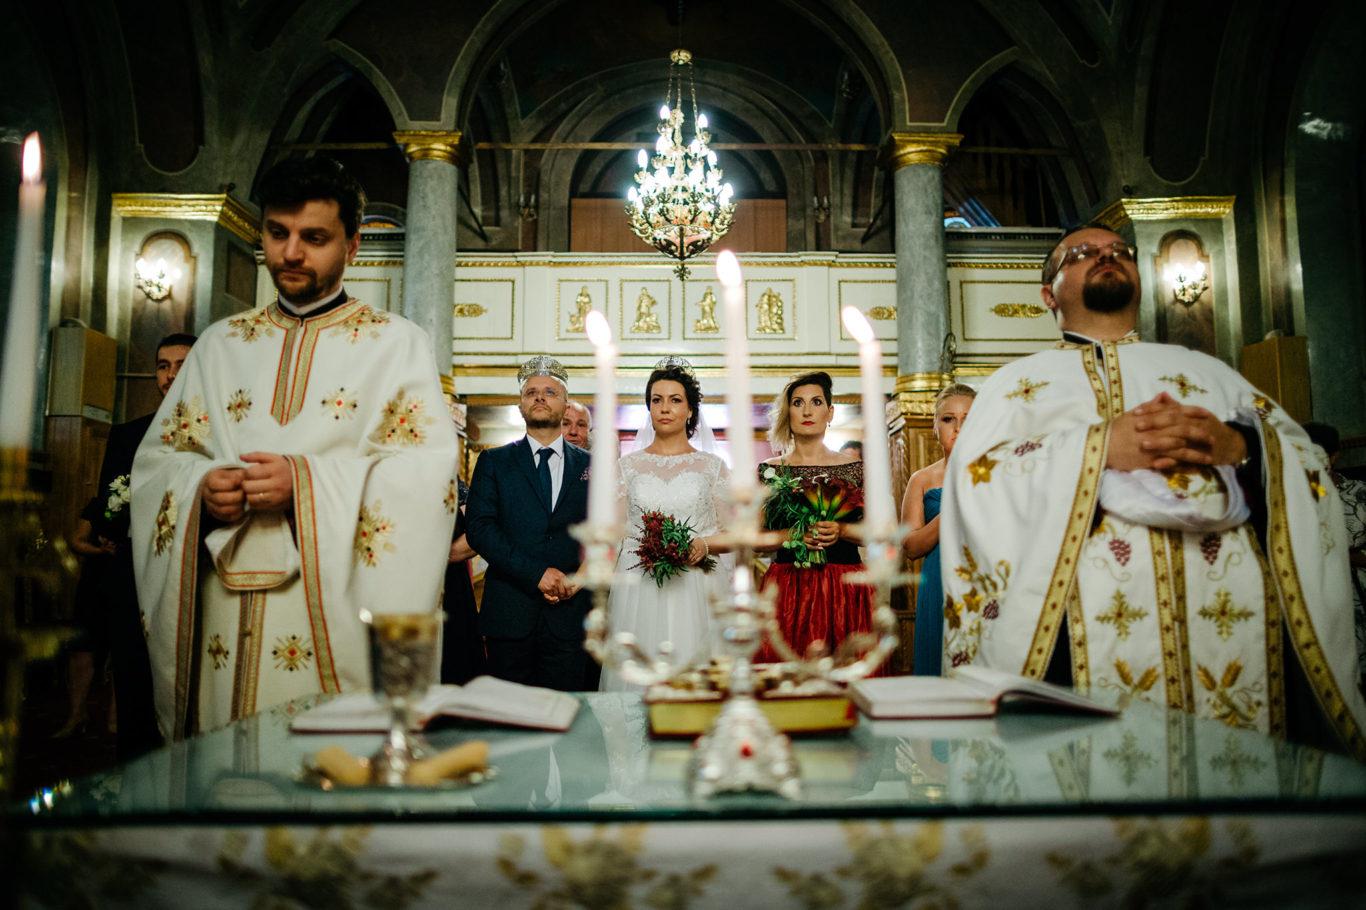 0408-fotografie-nunta-bucuresti-anca-george-fotograf-ciprian-dumitrescu-cdf_0168-3